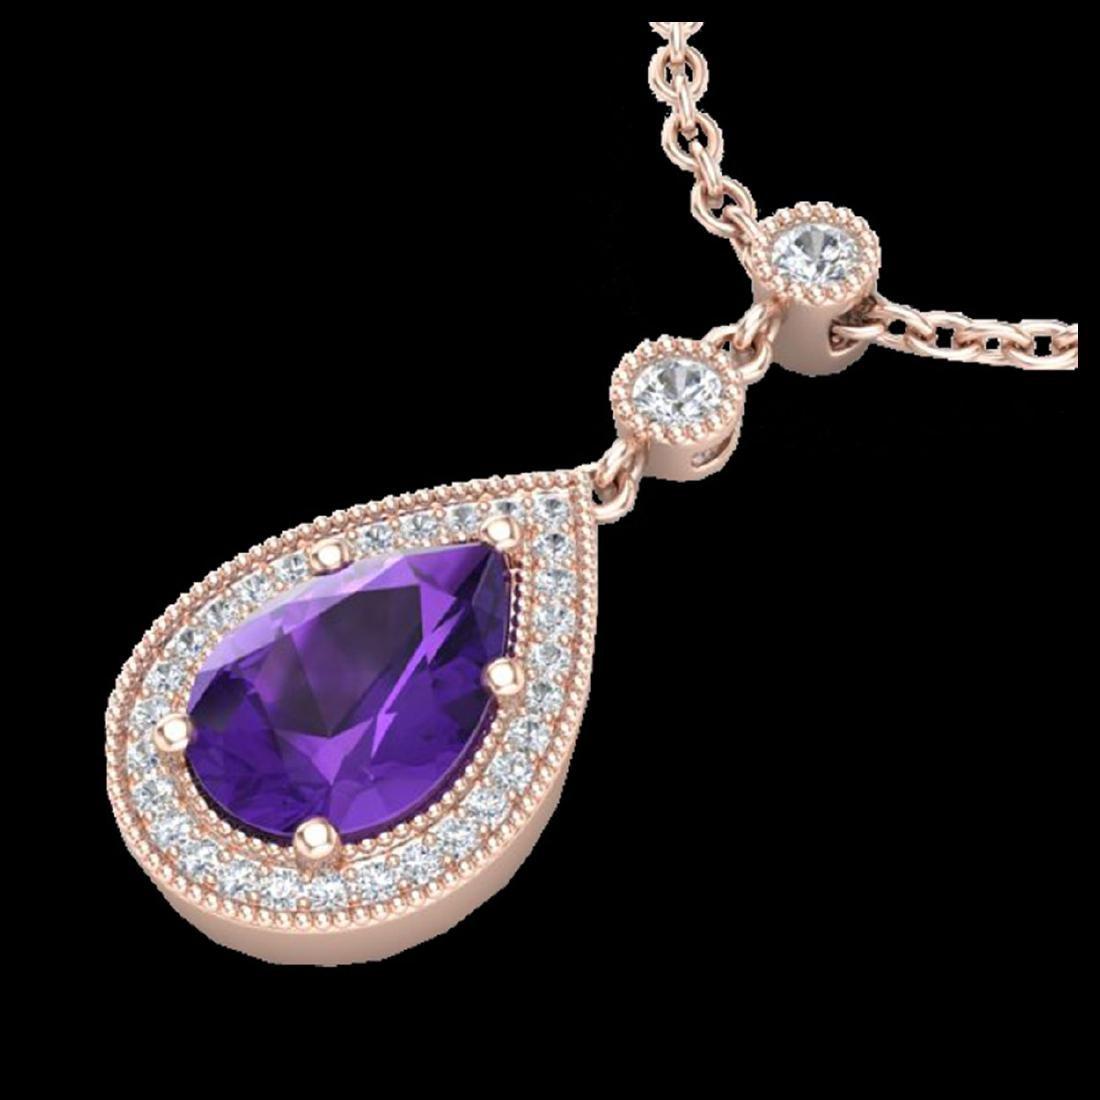 2.25 CTW Amethyst & Micro Pave VS/SI Diamond Necklace